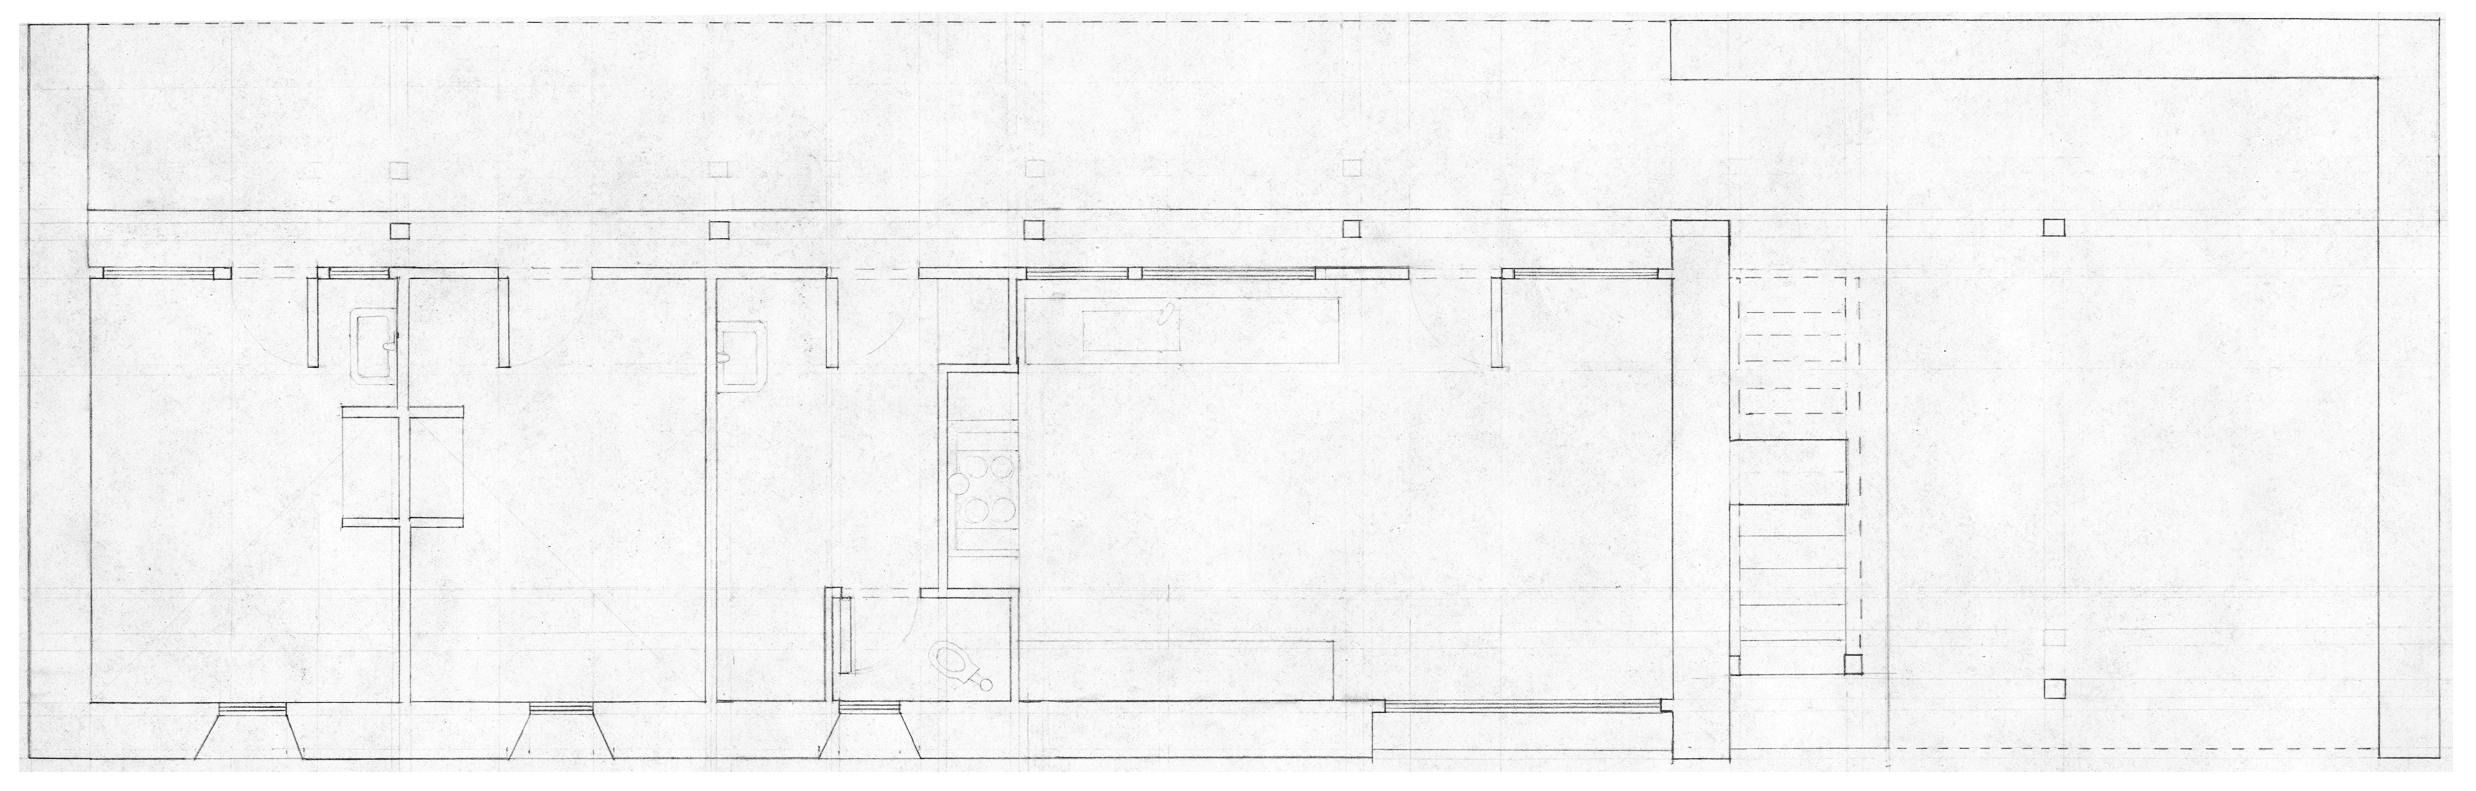 First Floor Plan18.png